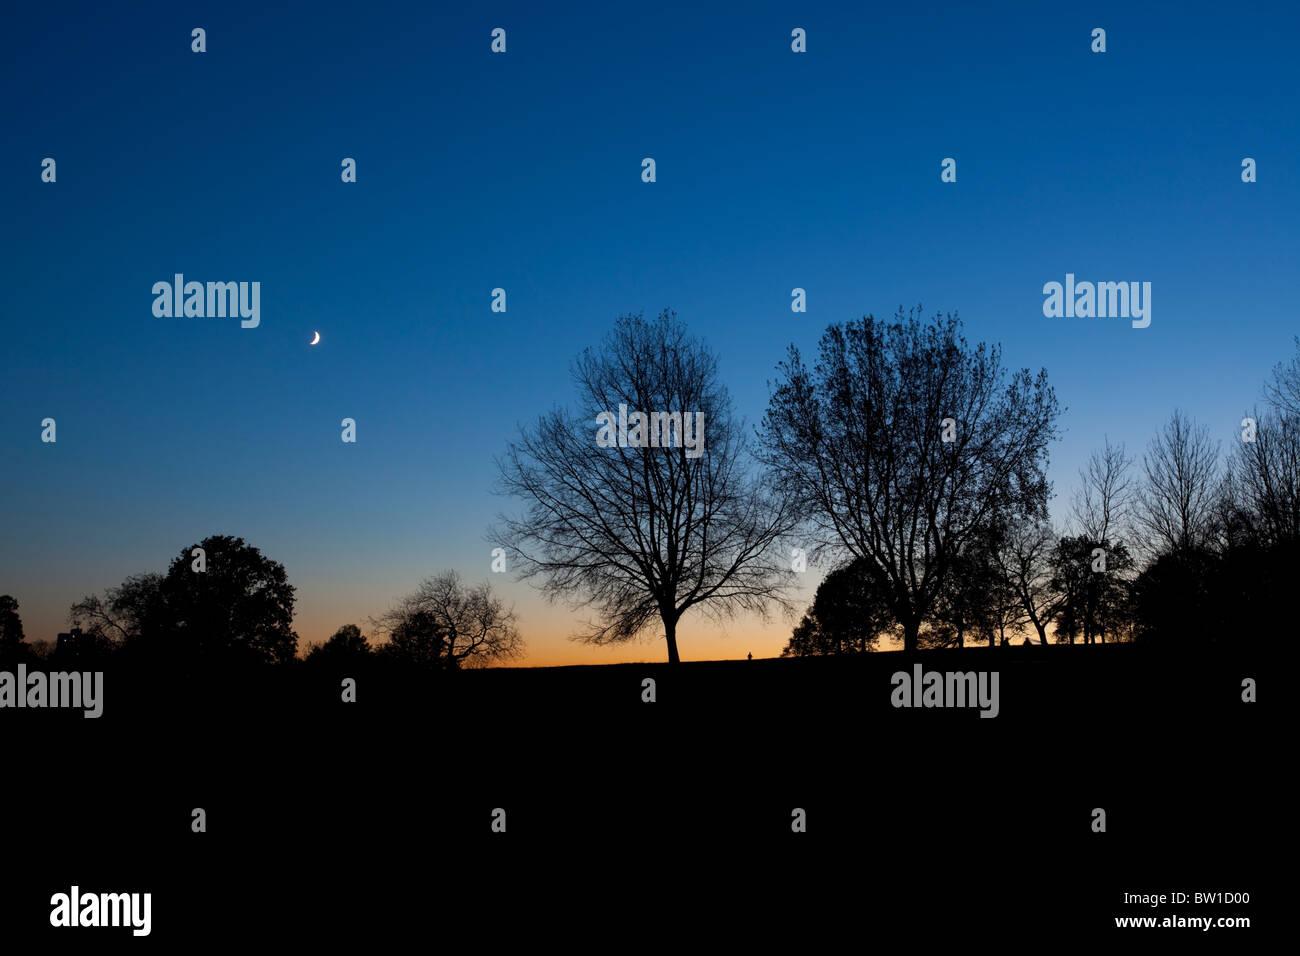 Hampstead Heath at twilight, Highgate, London, England, UK - Stock Image